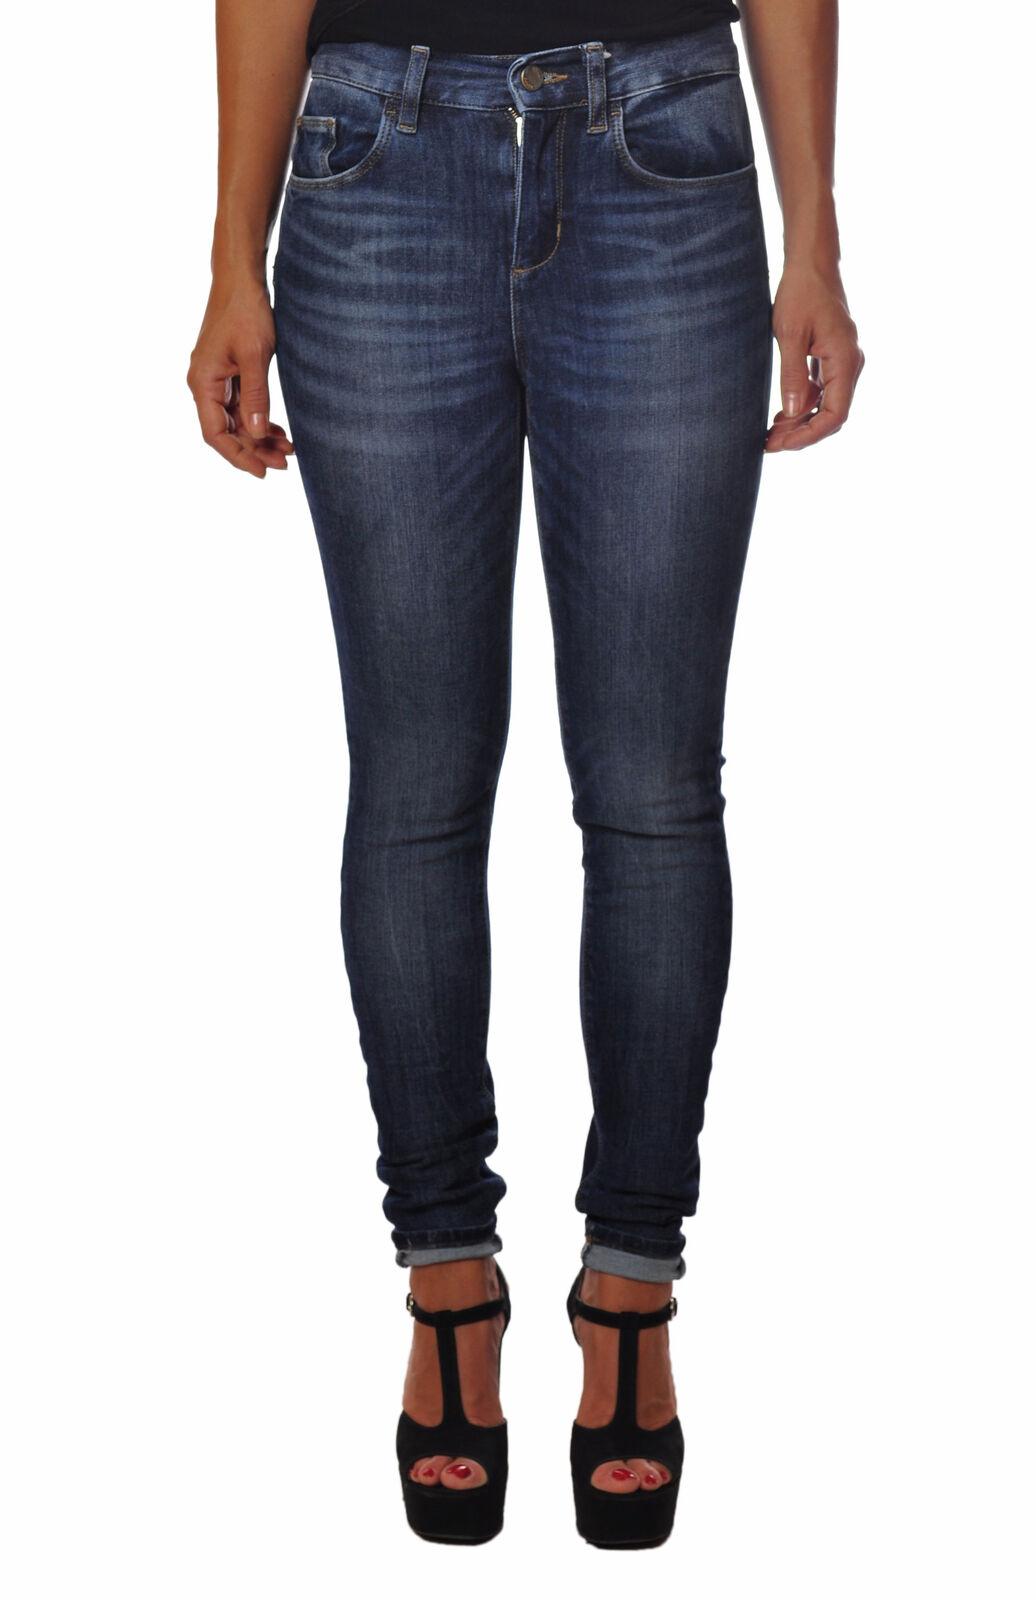 Liu-Jo - Jeans, Trousers, leg - Woman - Denim - 2849409D191120